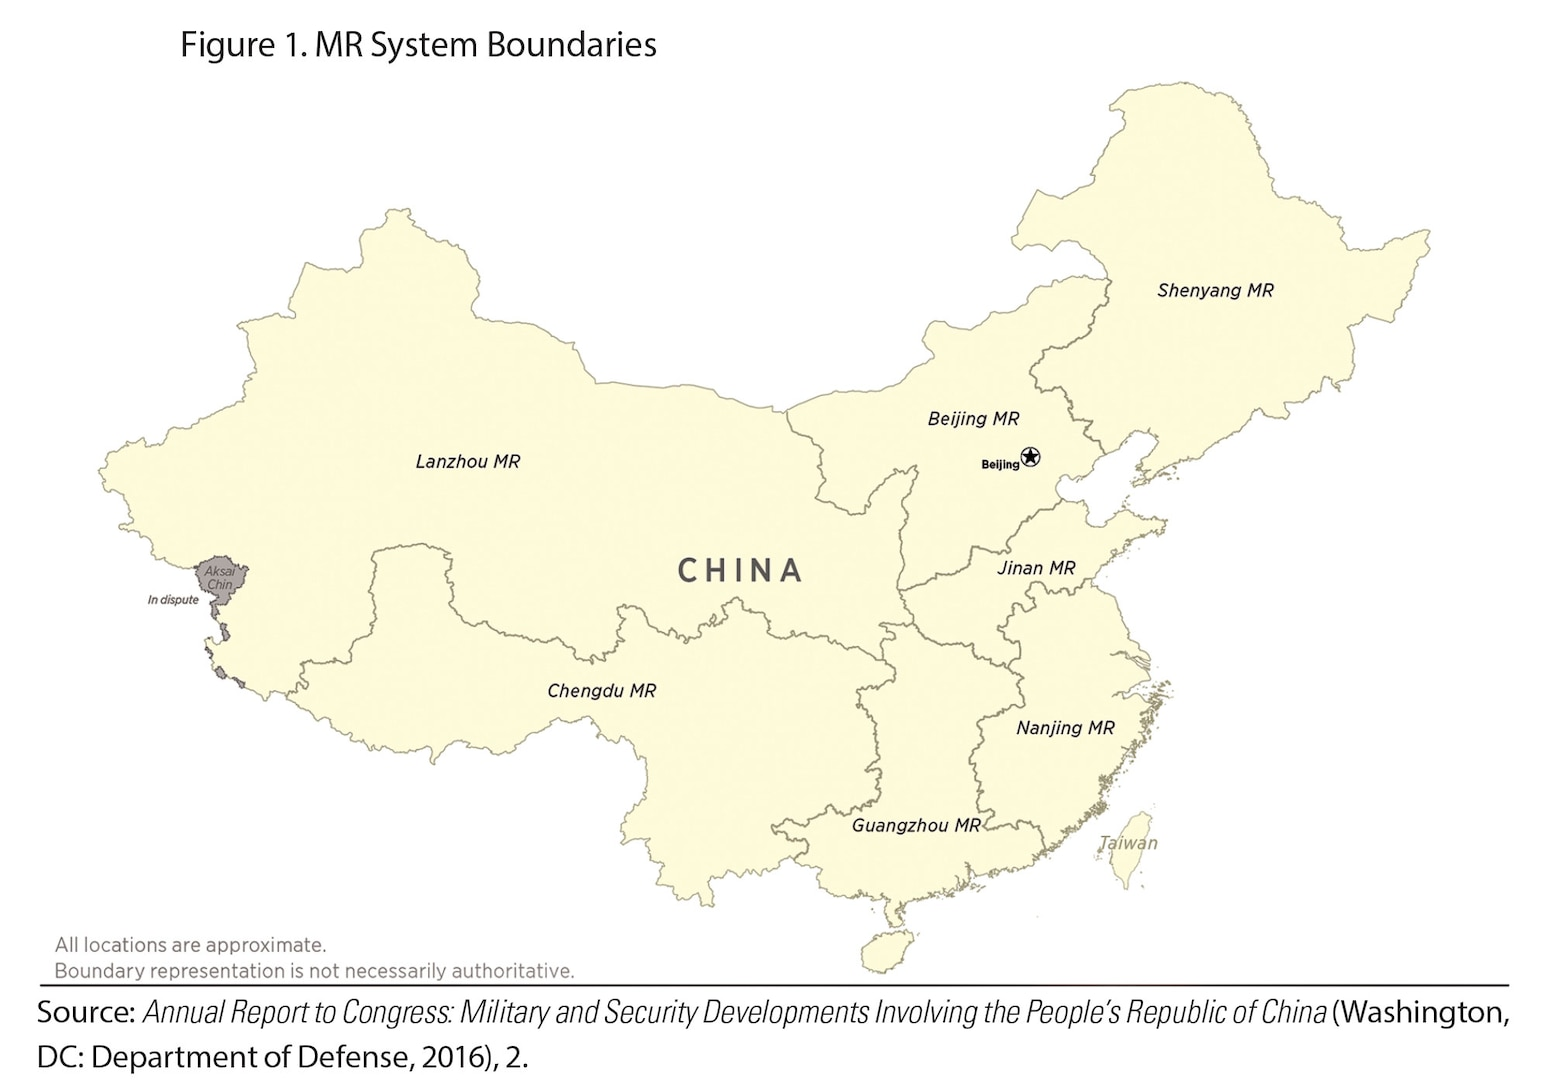 Figure 1. MR System Boundaries